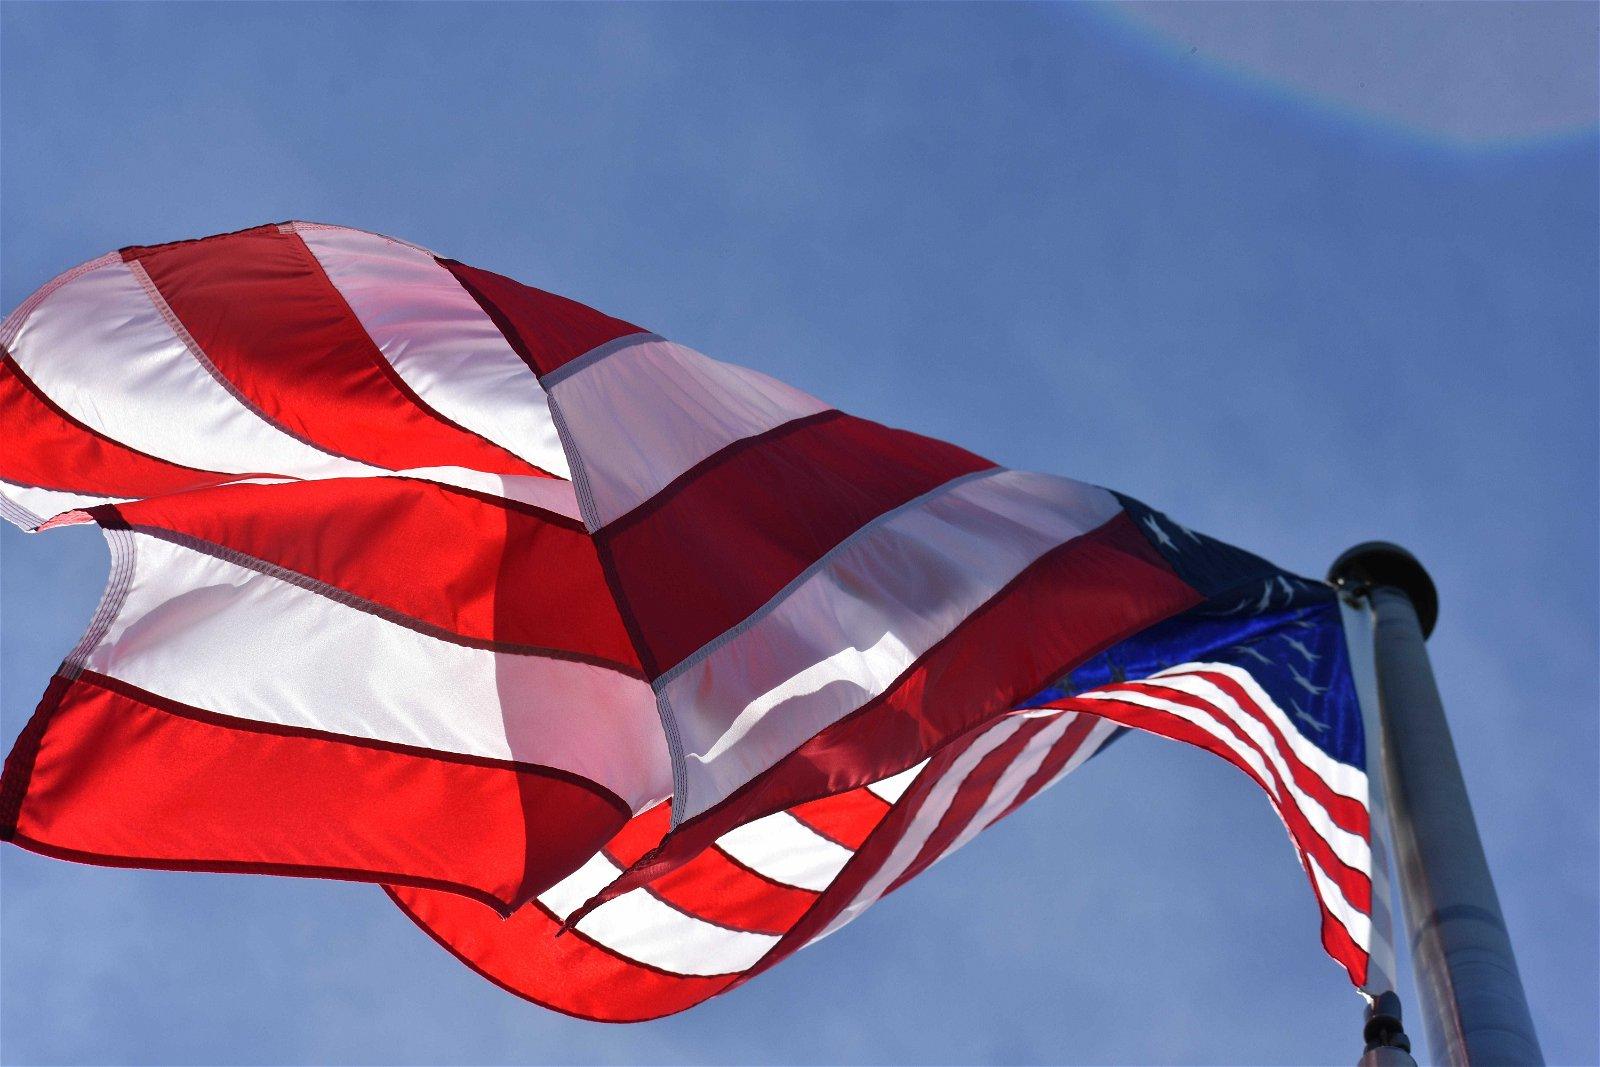 VA Reexaminations and Reductions of Veterans Disability Benefits